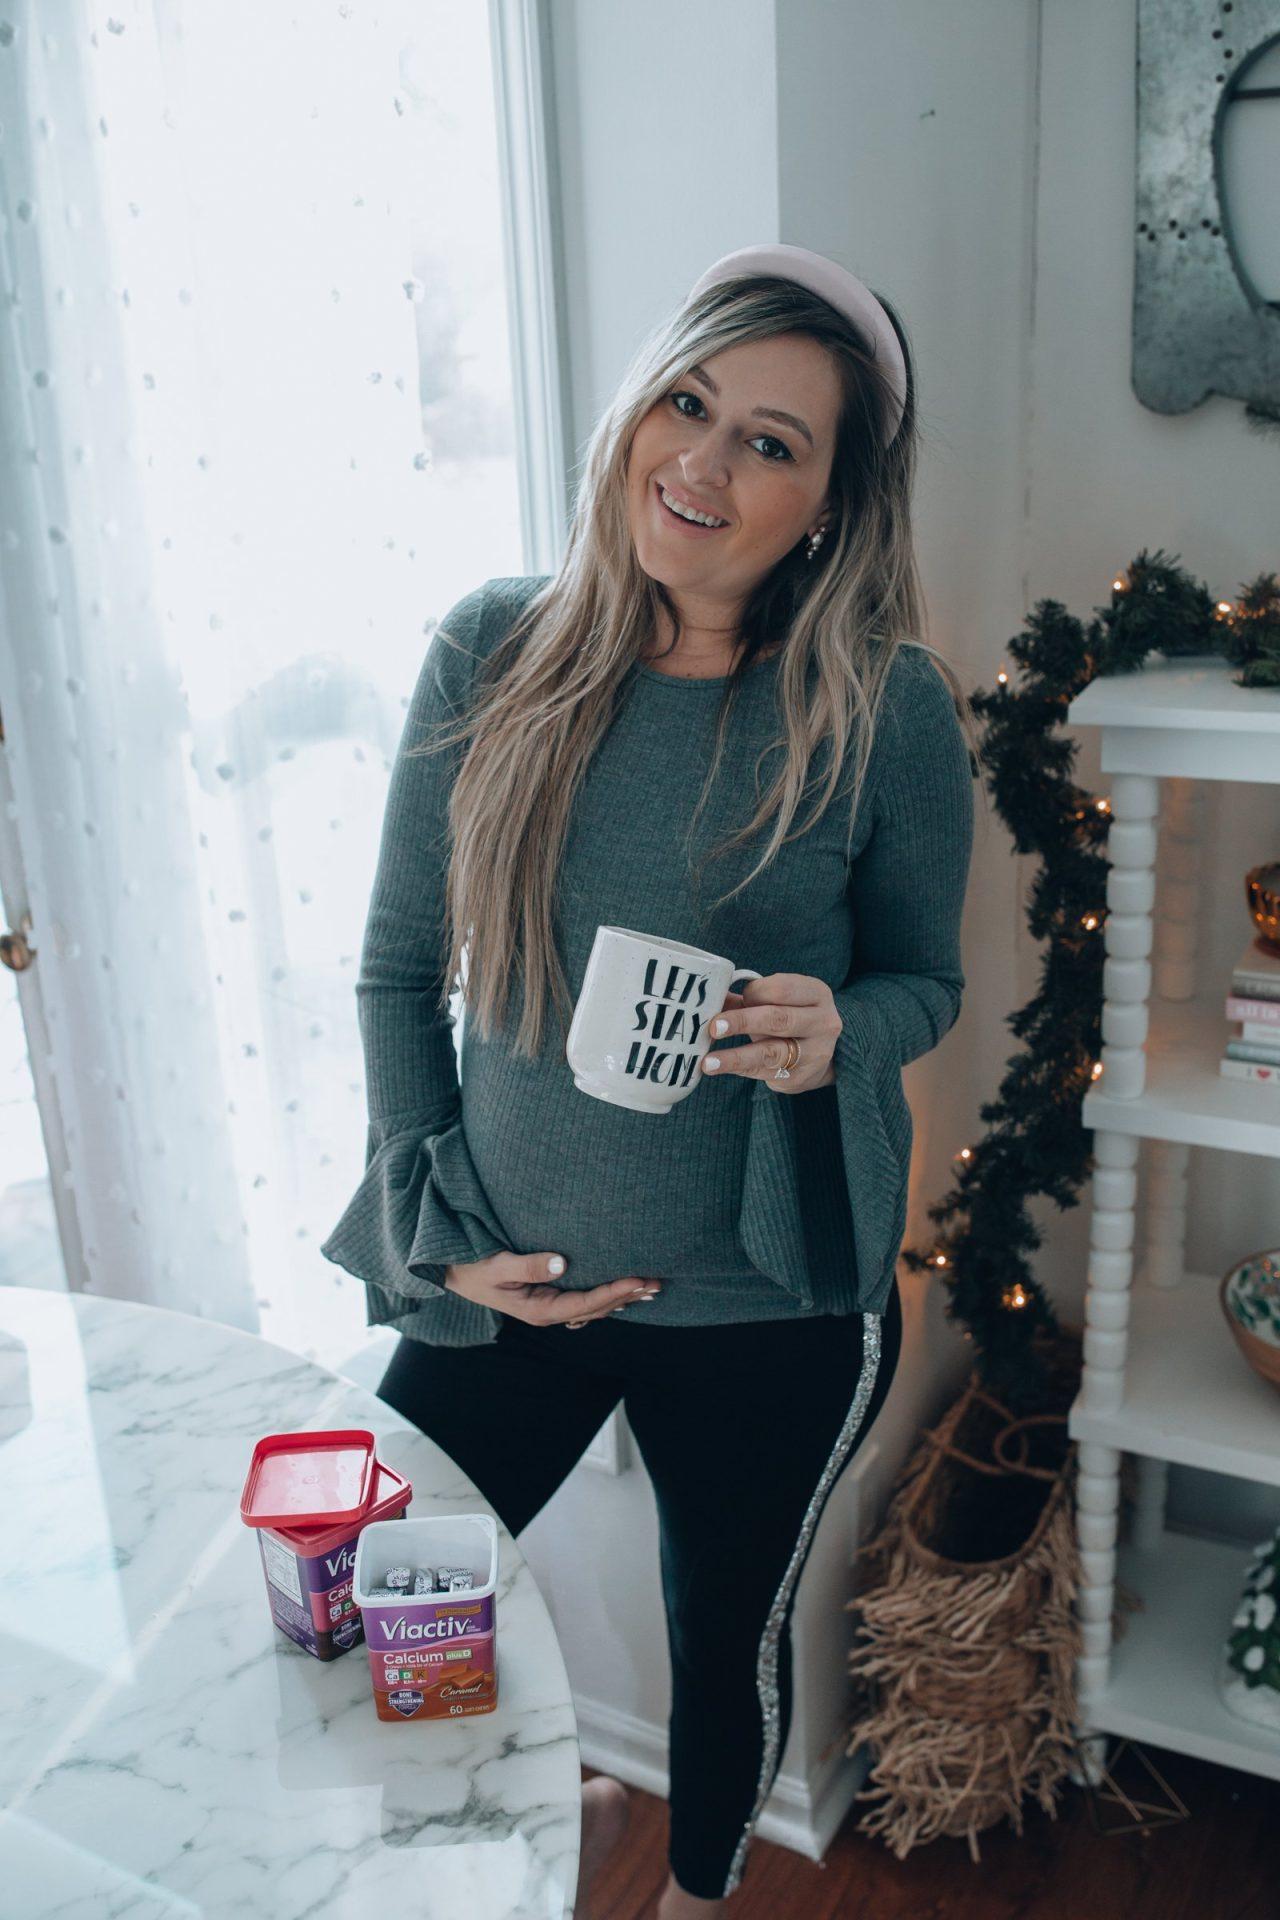 calcium in pregnancy, viactiv soft chews